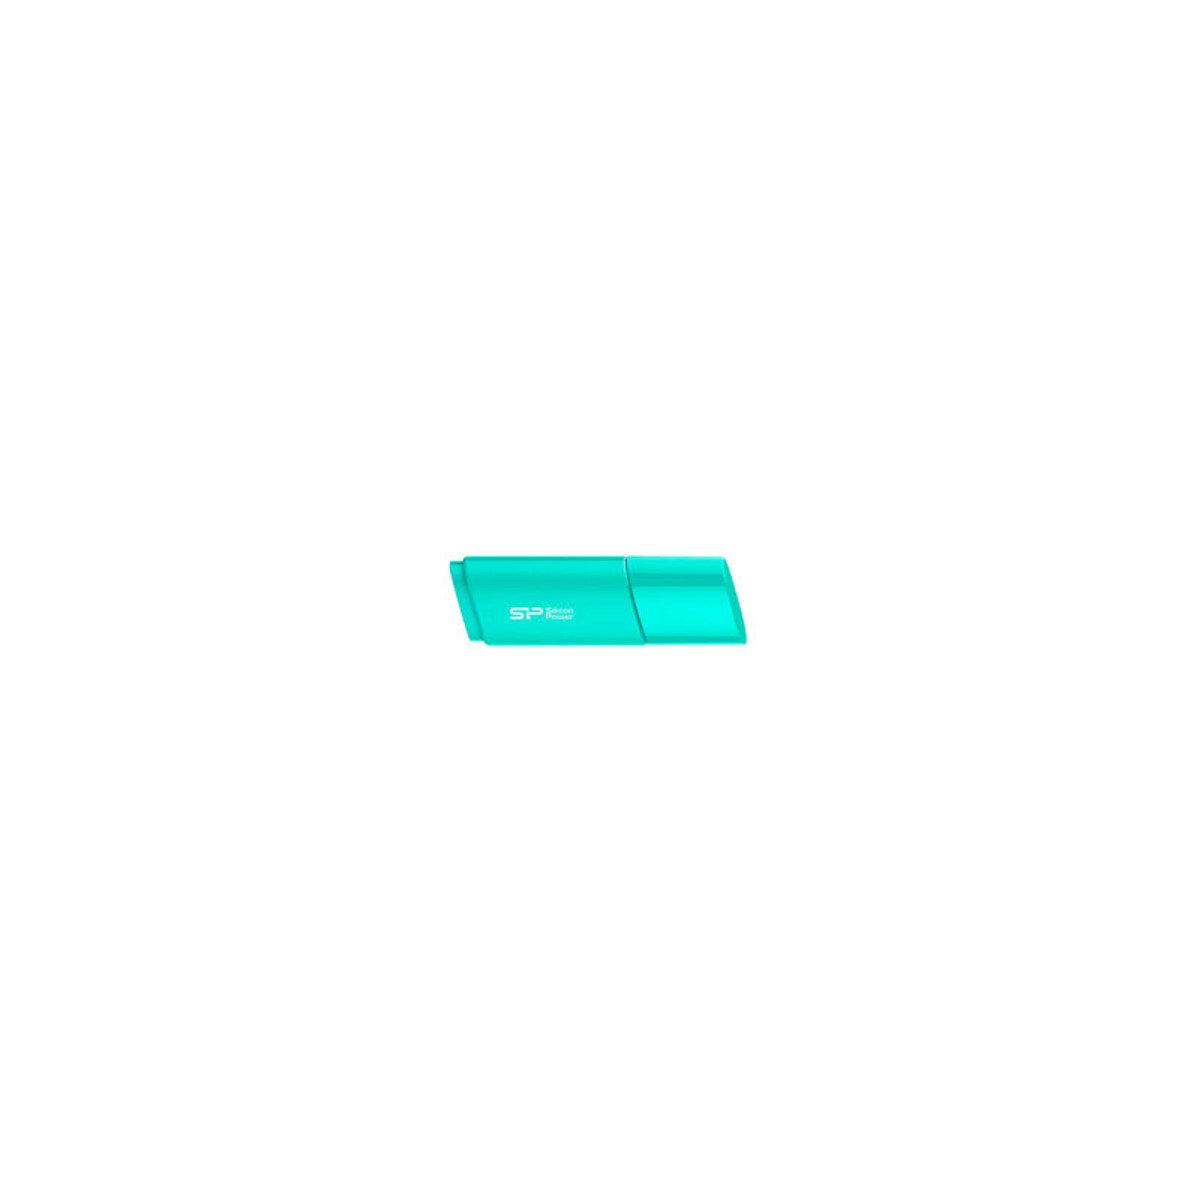 USB2.0快閃記憶棒 Ultima U06 32GB 湖水藍